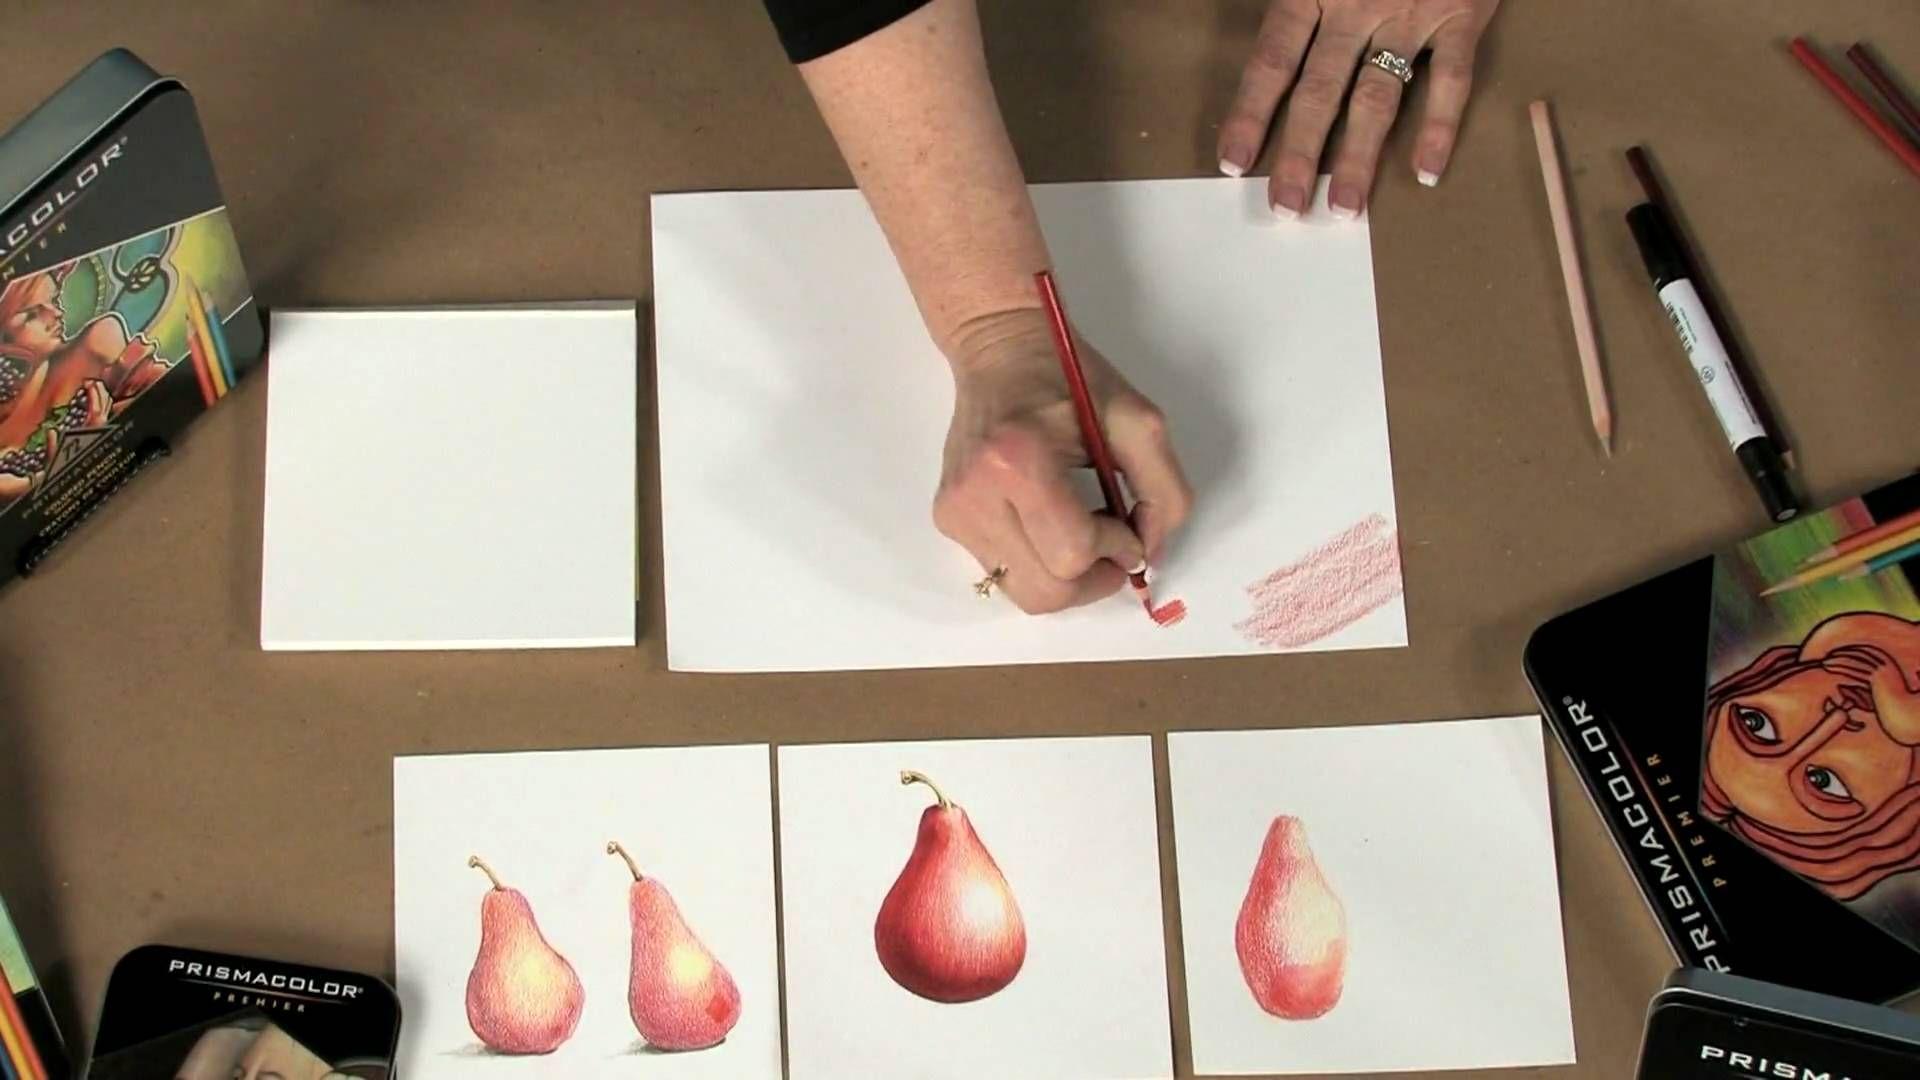 Prismacolor Colored Pencils Tips Amp Techniques Watch This